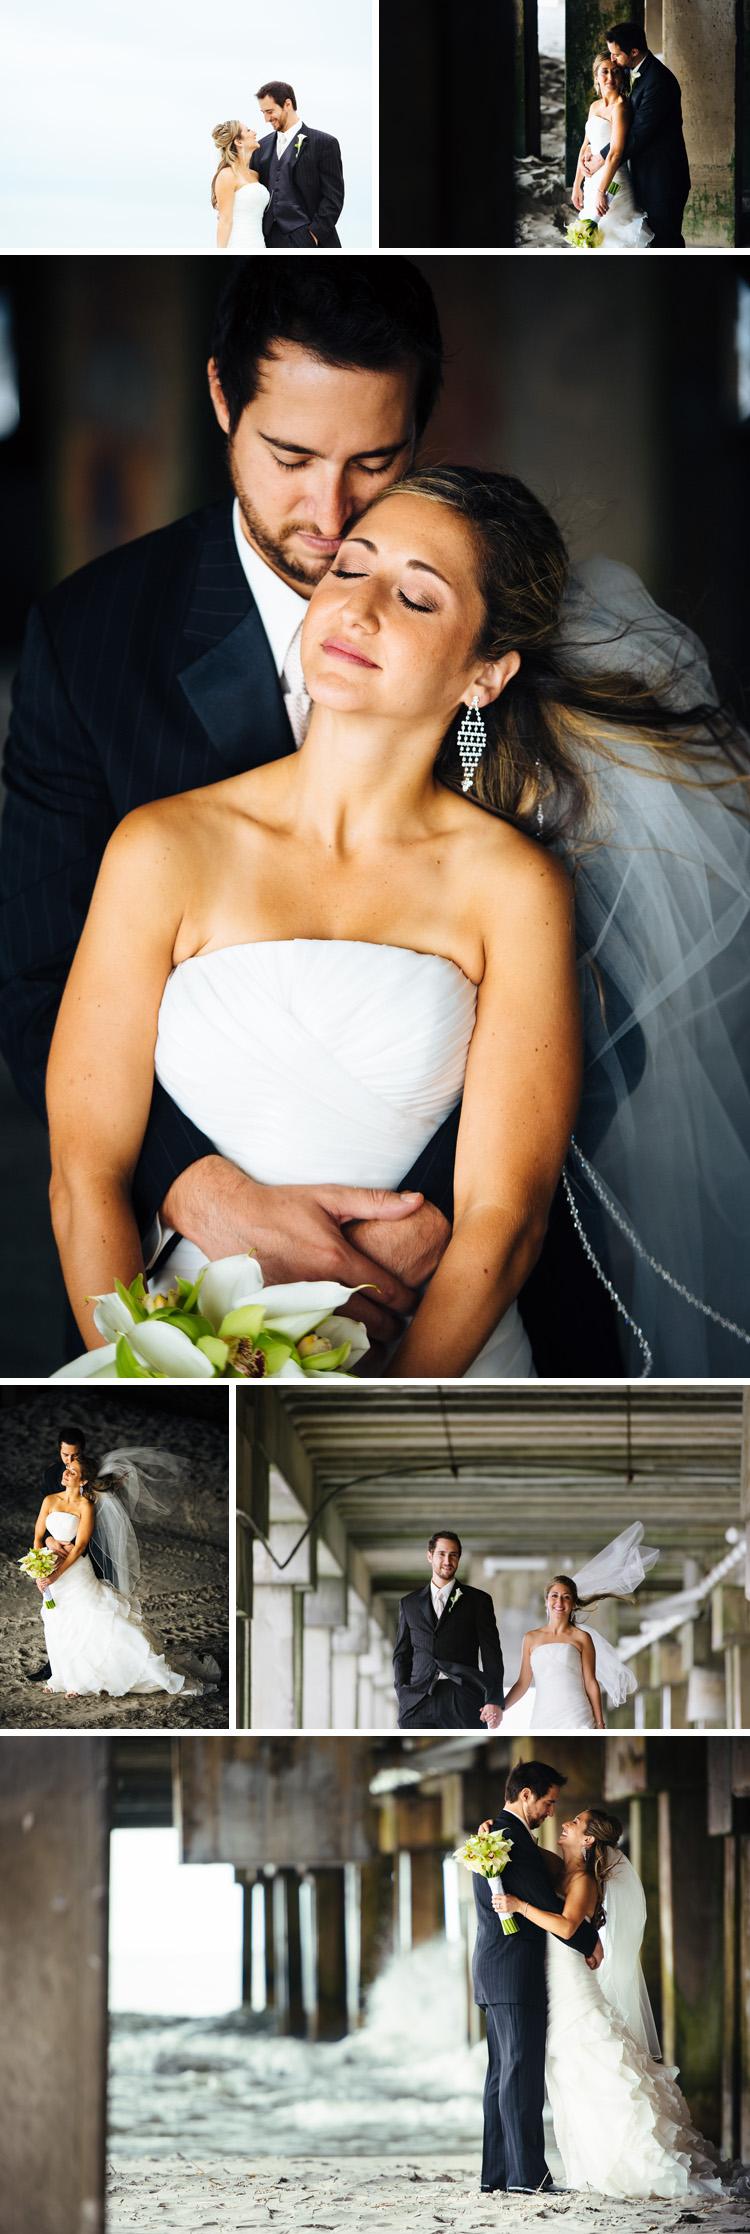 one-atlantic-wedding_53.JPG